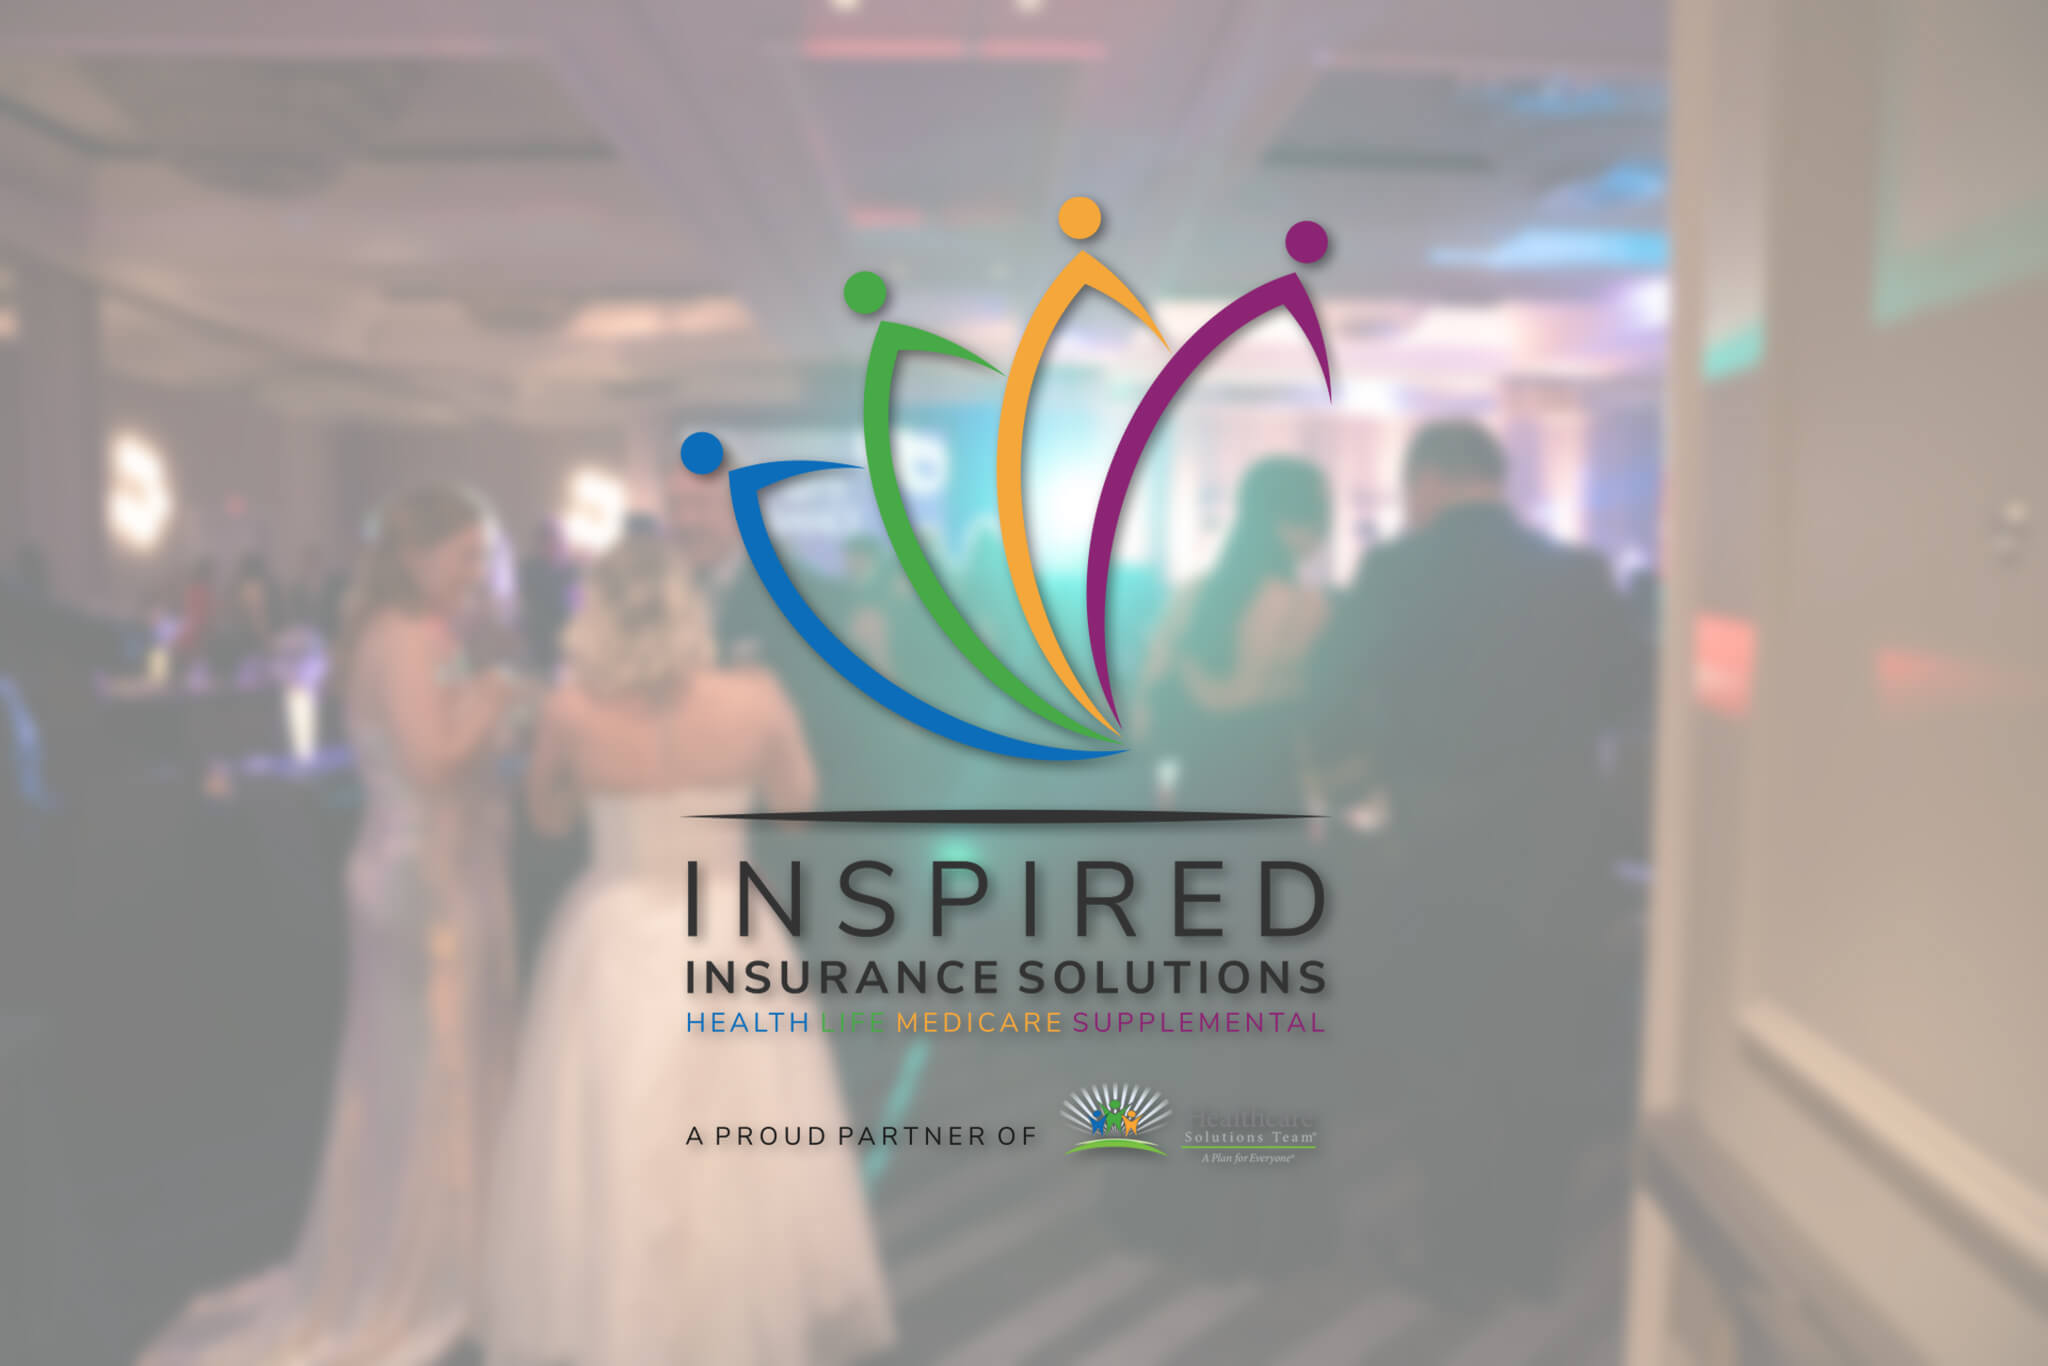 Inspired Insurance Solutions, LLC